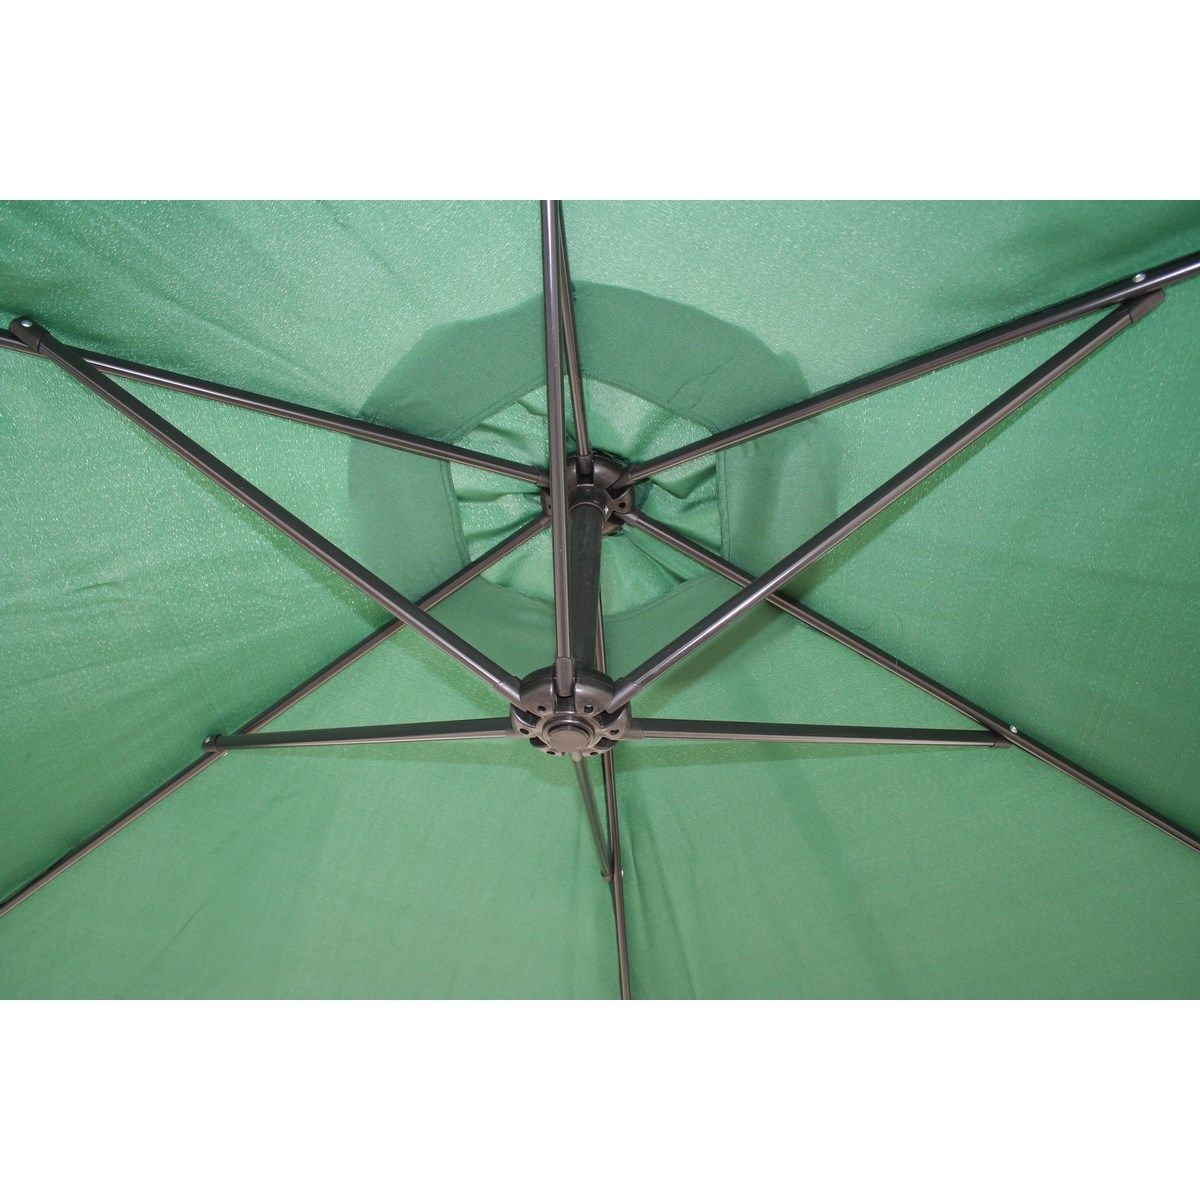 6d00e5f79 Happy Green Závesný slnečník zelená, 300 cm - Bytové doplnky a dekorácie